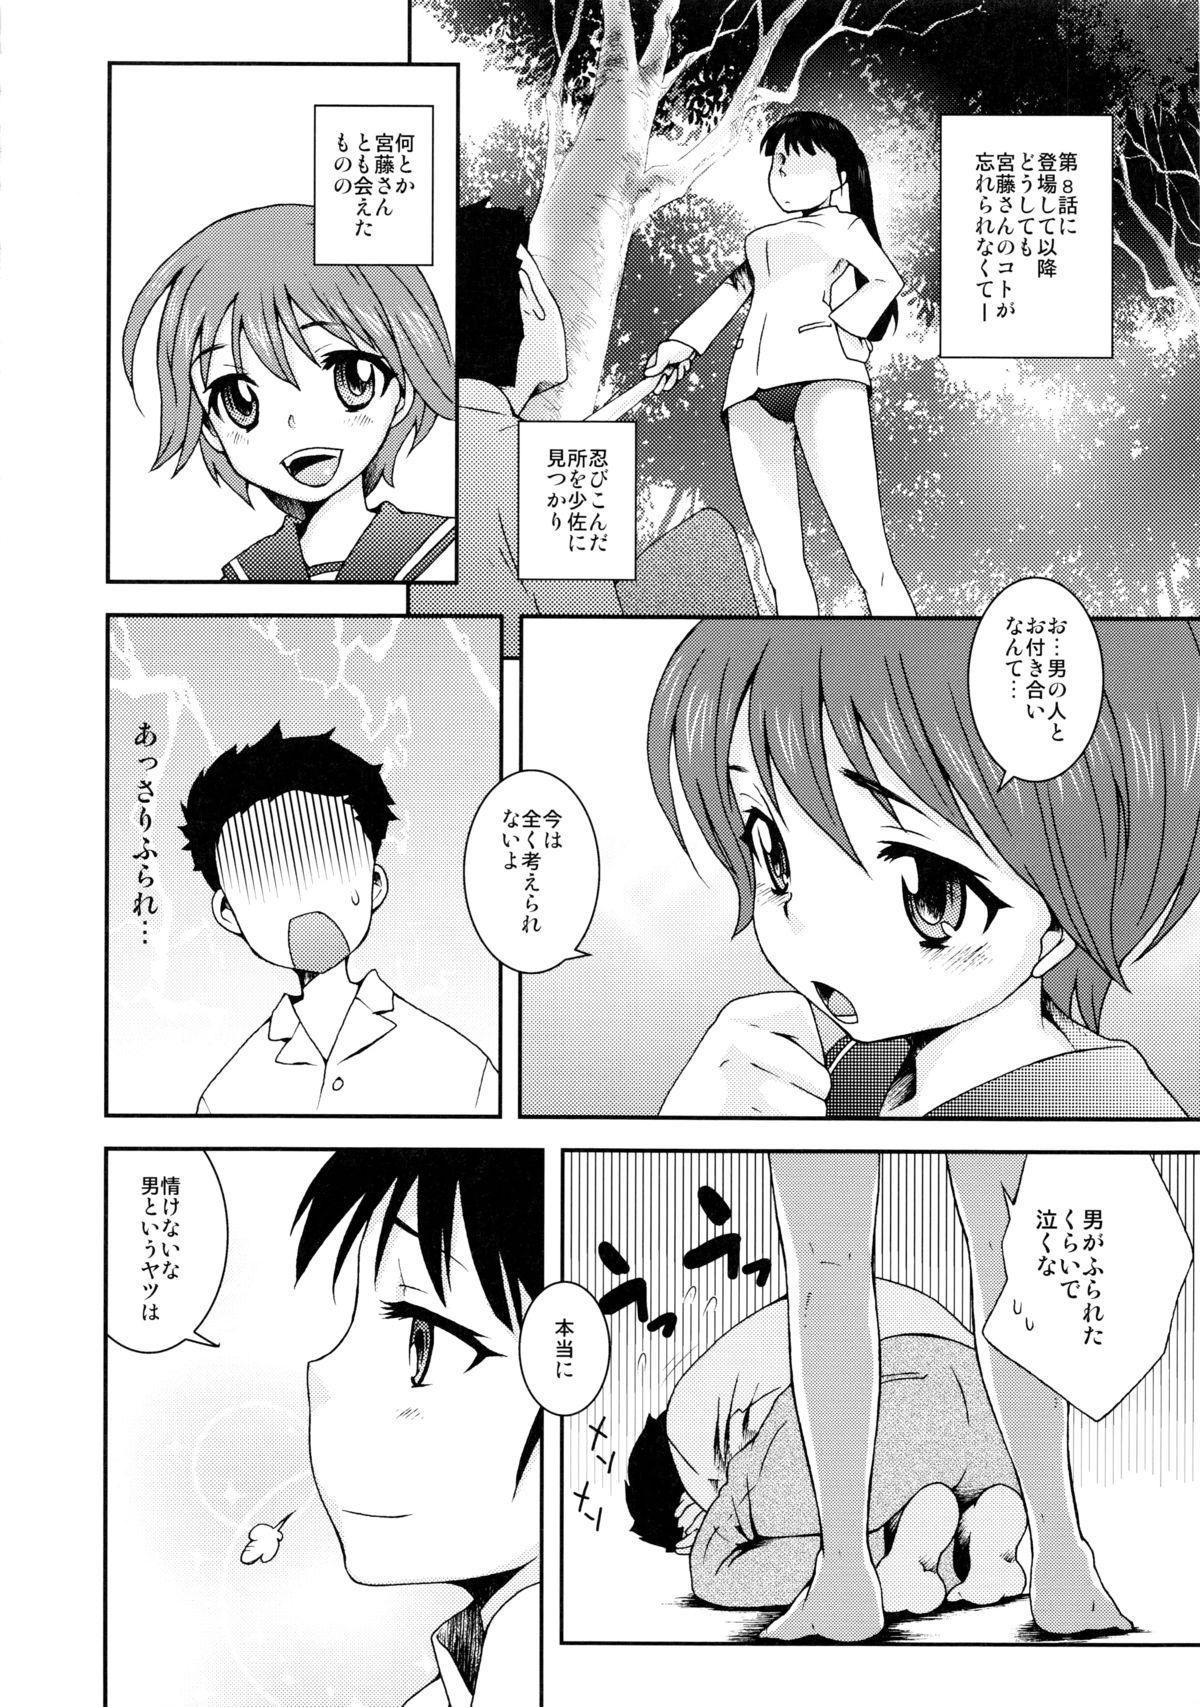 School-mer! School Mizugi Bloomer Joshi Anthology 106